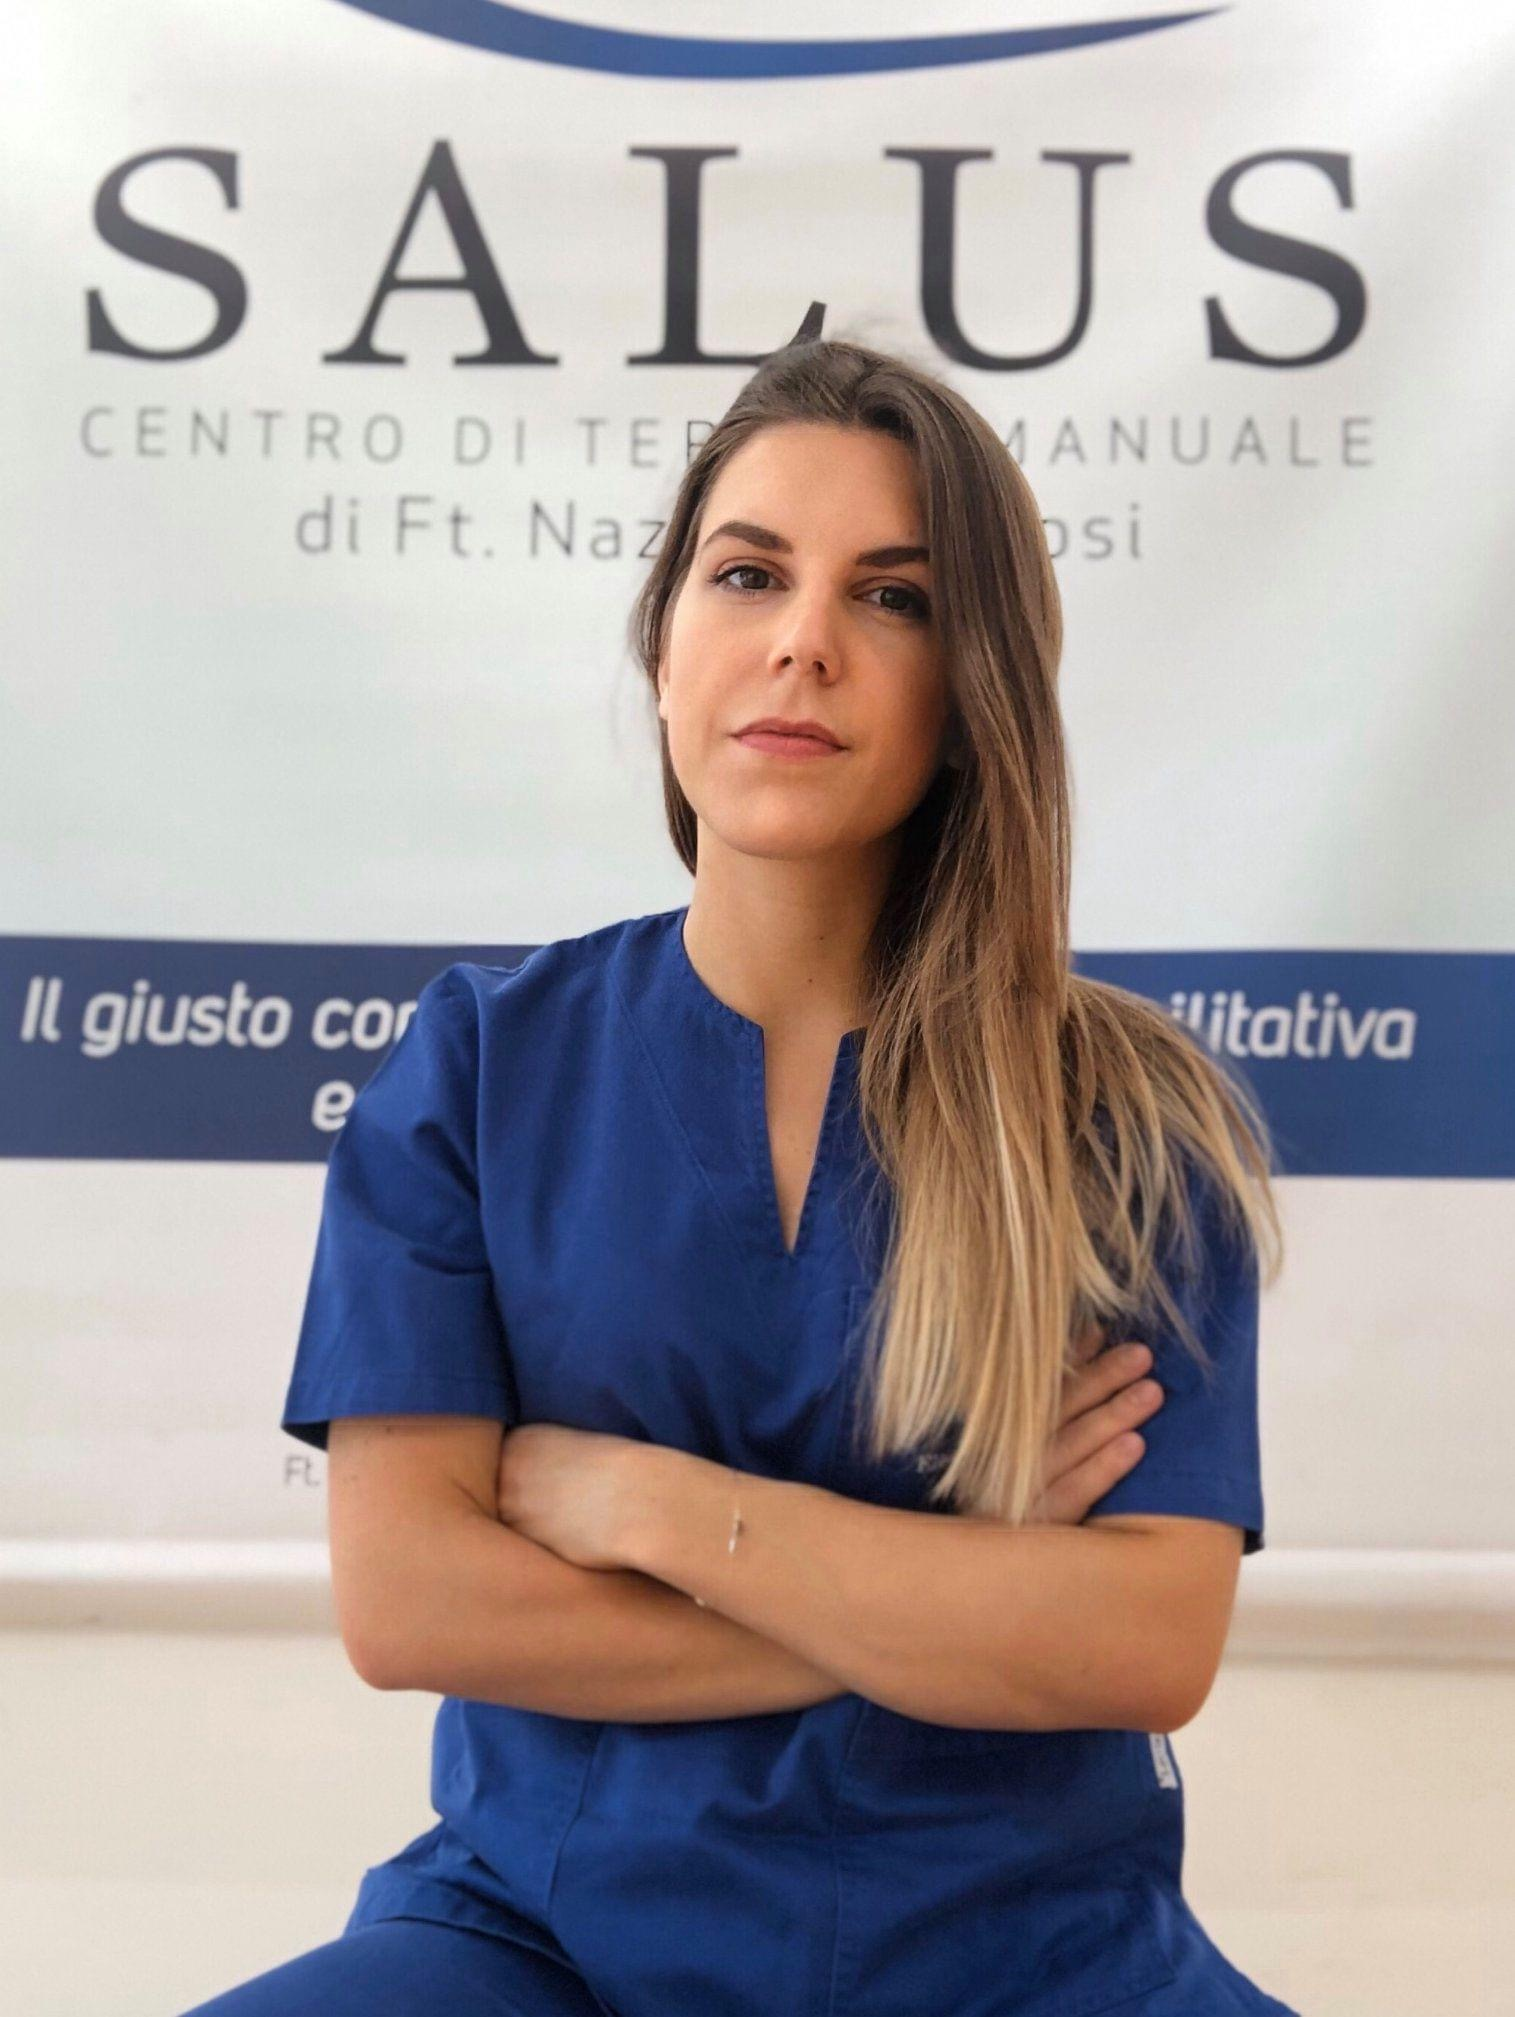 Elisa Rosi - Laurea in Scienze Motorie e Sportive